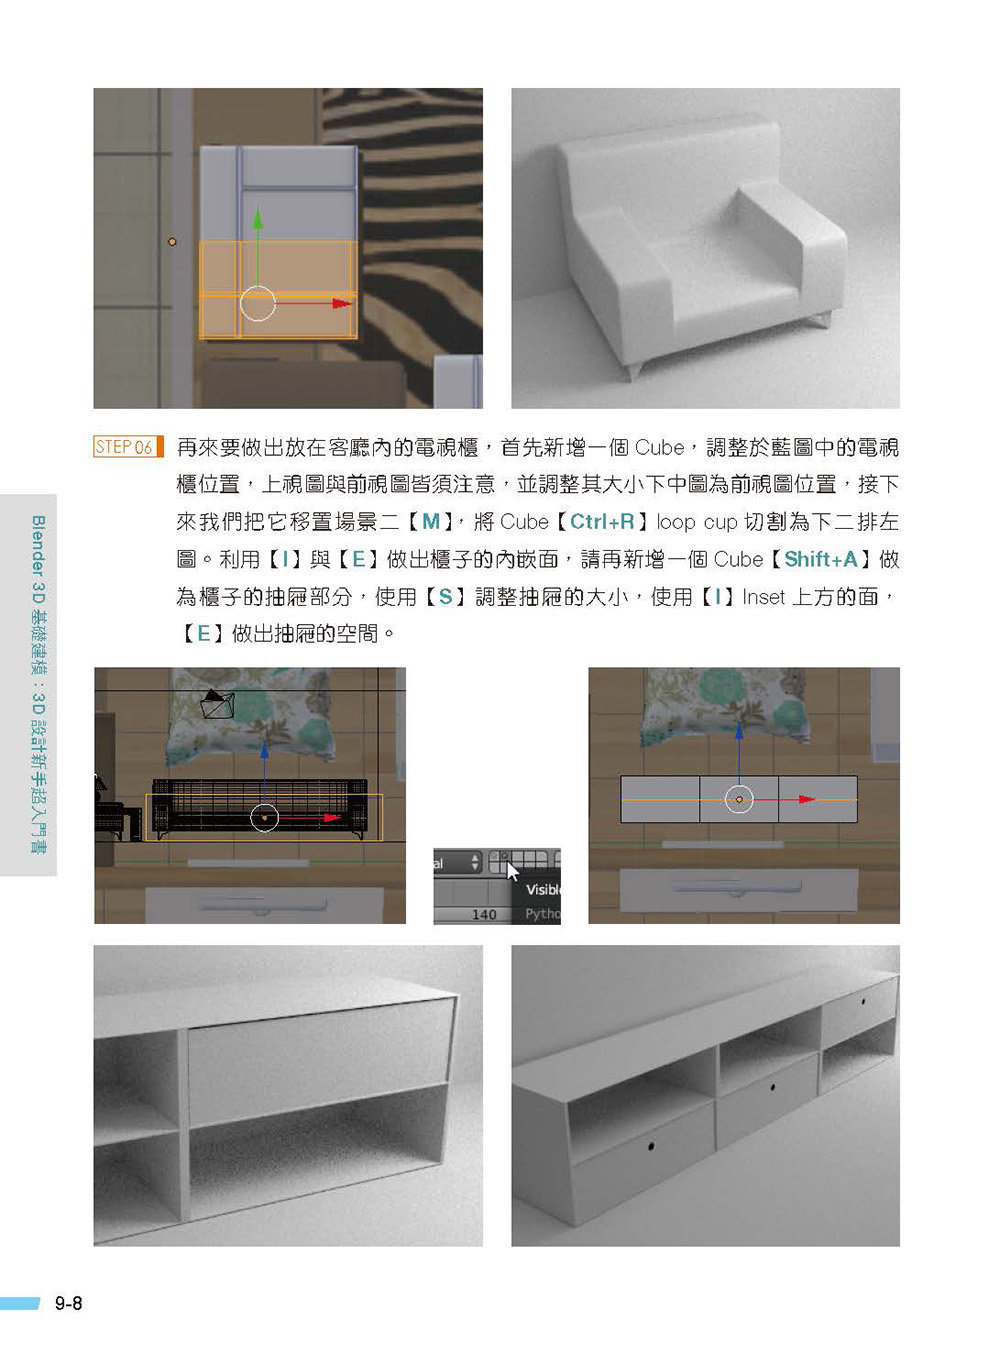 Blender 3D 基礎建模 : 3D設計新手超入門-preview-8